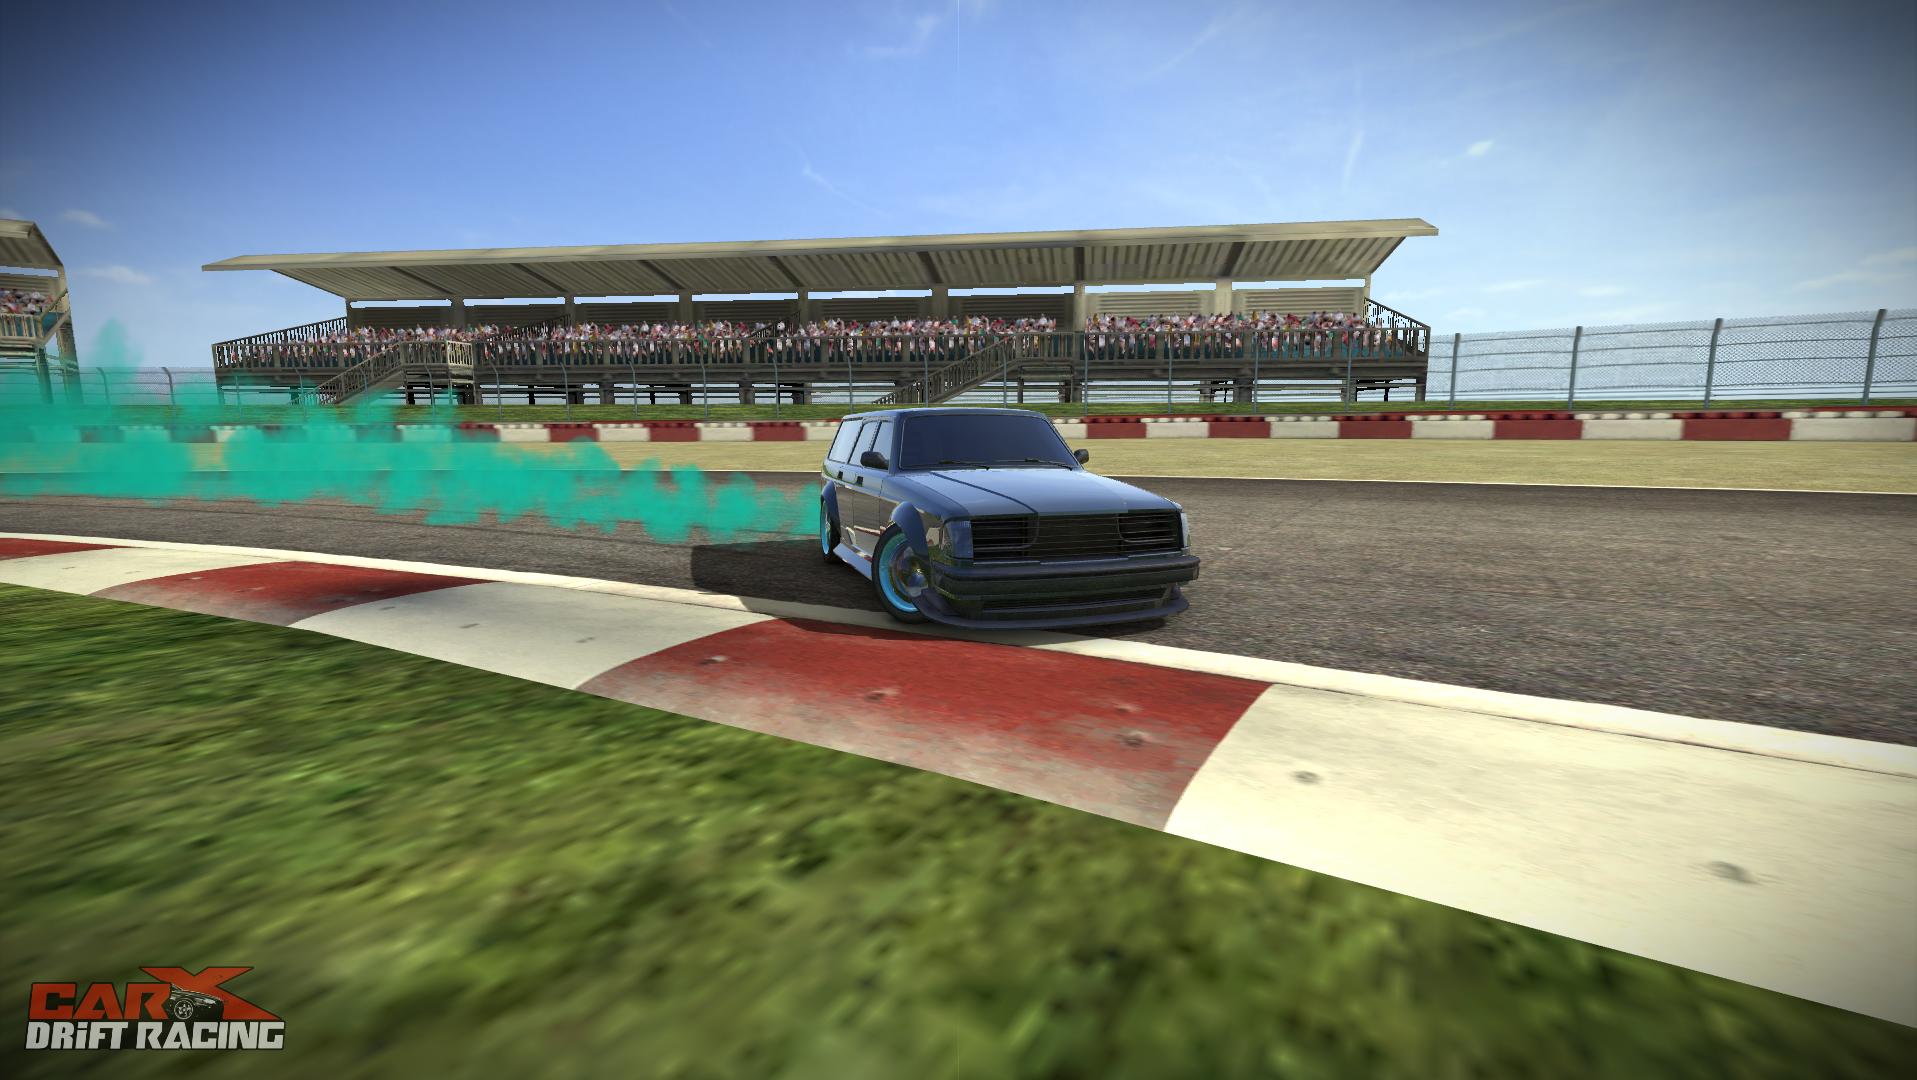 Created By Carx Drift Racing Carx Drift Racing